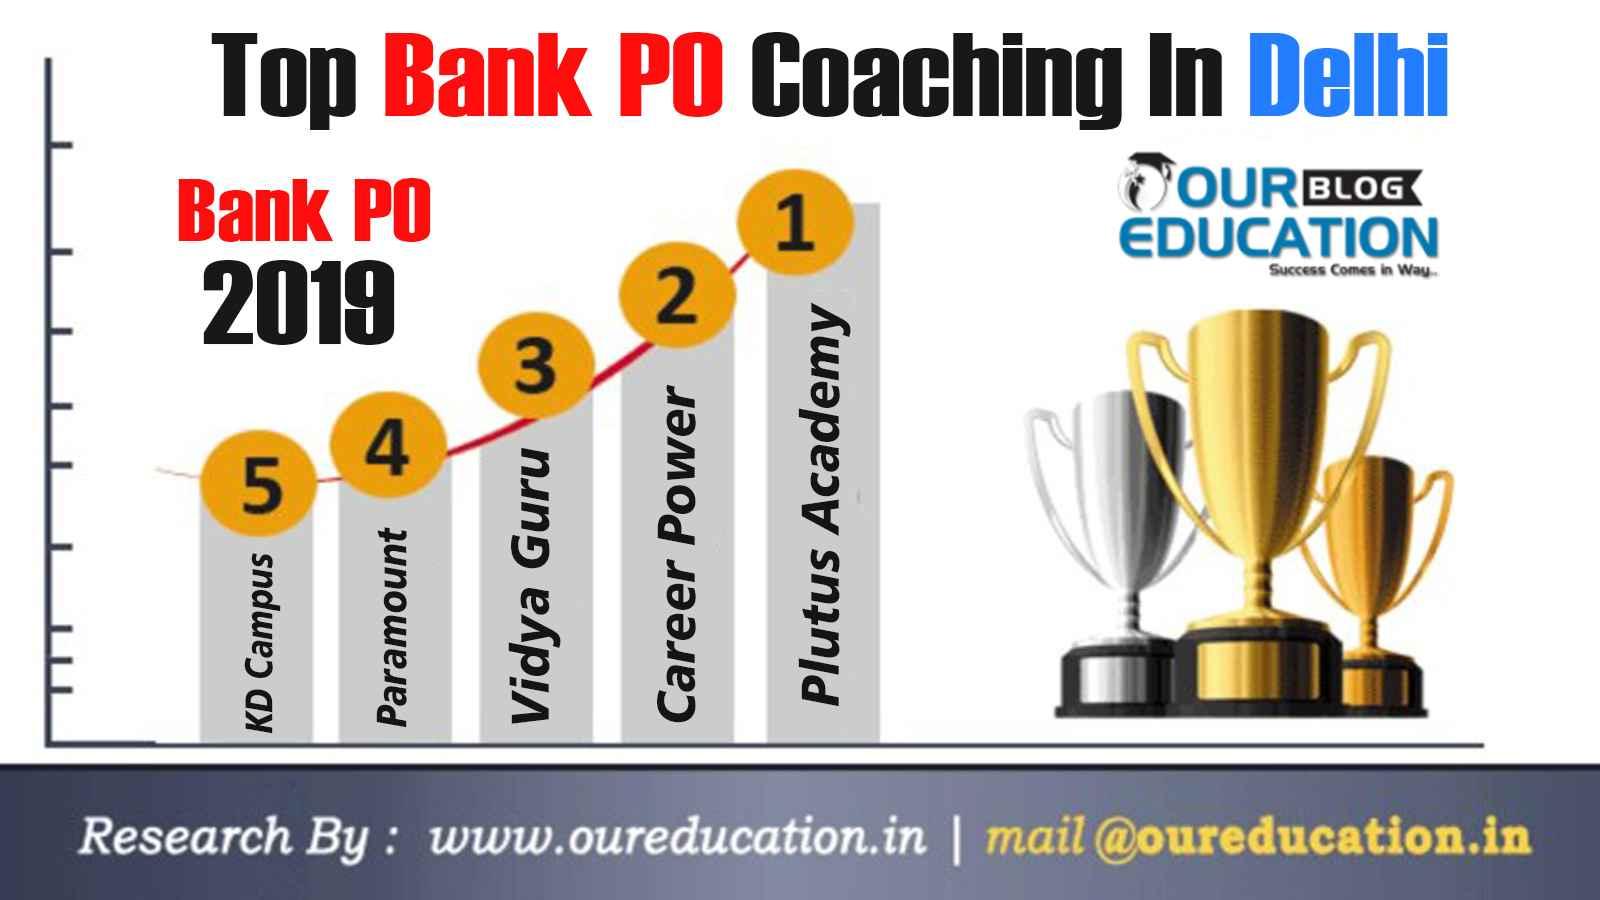 Best 10 Bank Po Coaching Institutes In Delhi India Prepare Bank Exams